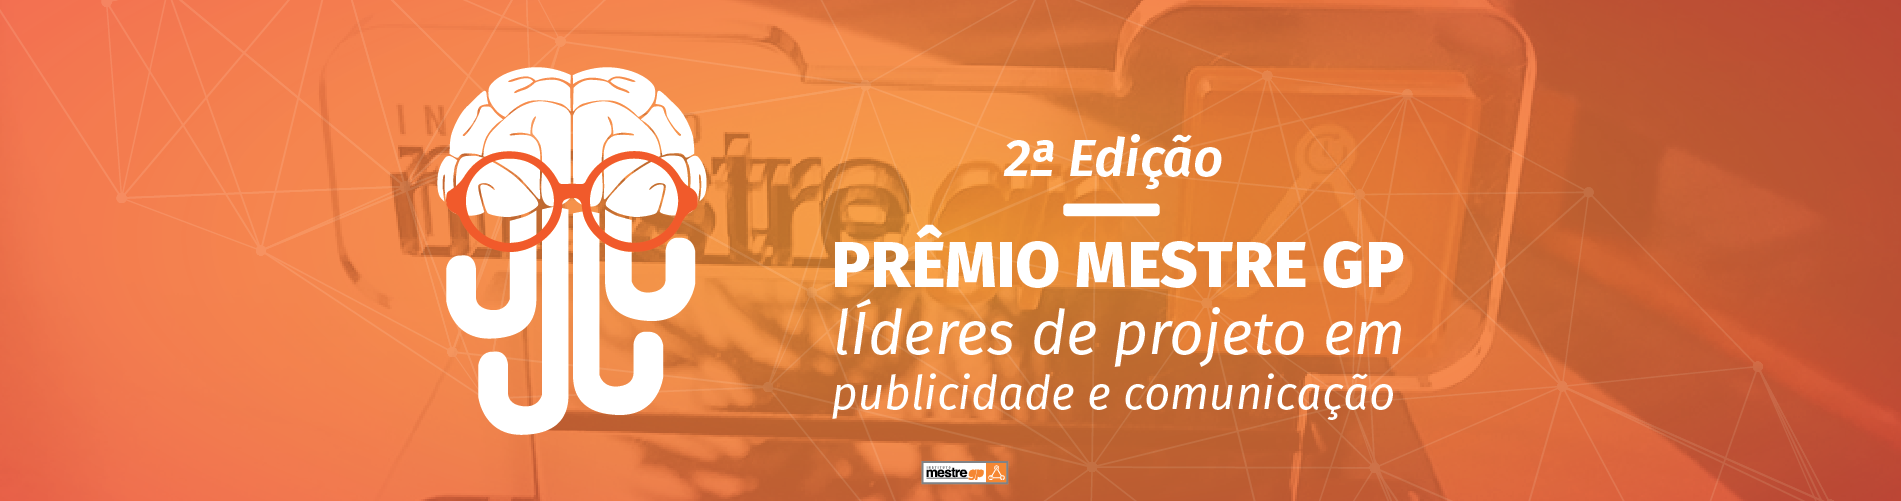 https://www.mestregp.com.br/wp-content/uploads/2017/07/enxovalPremio_1900x500-1.png